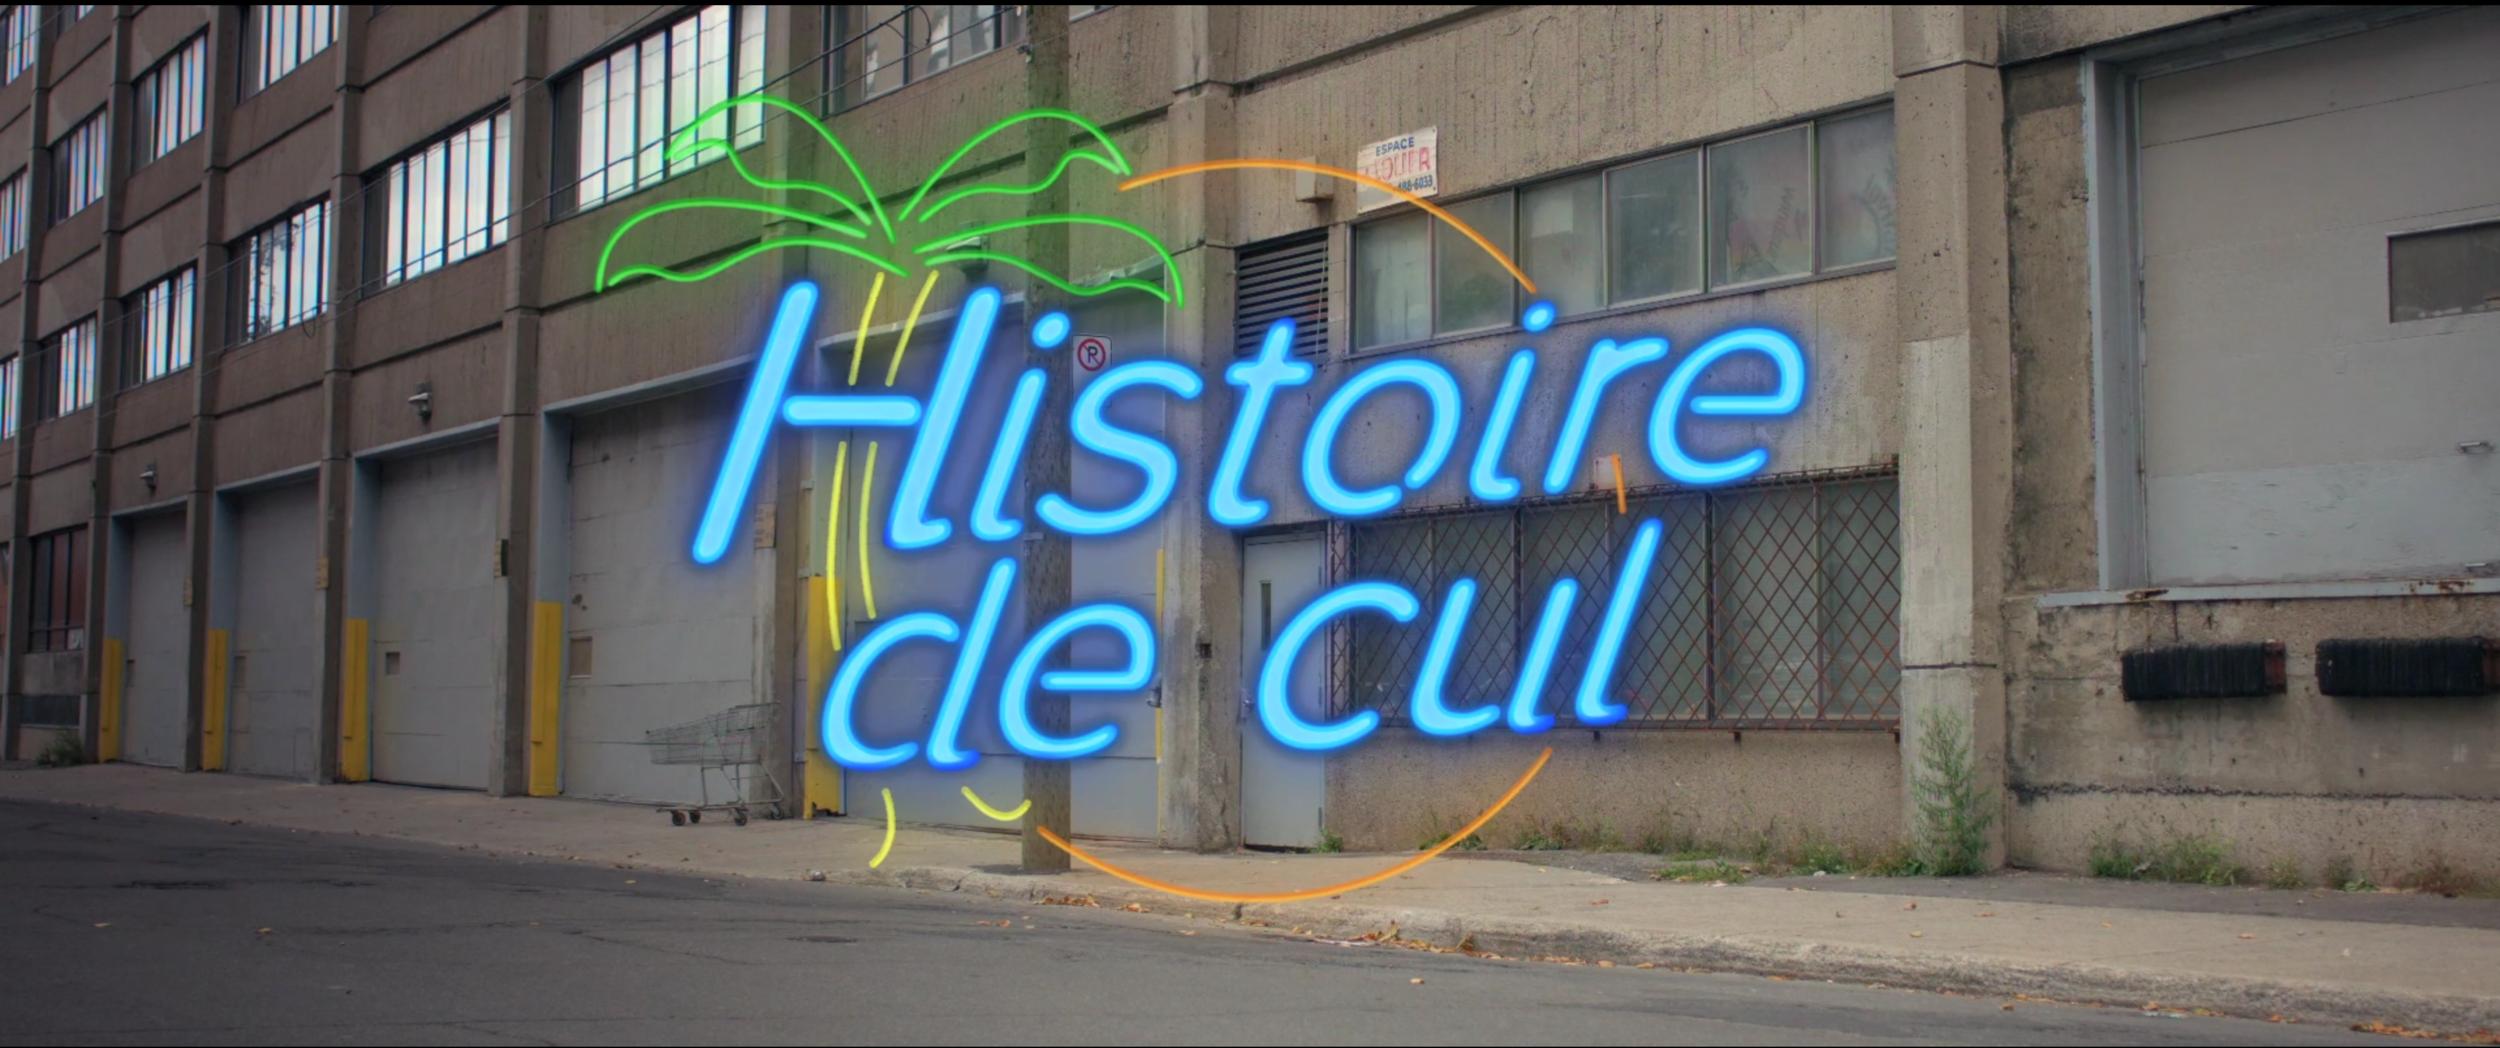 Histoire de cul -  Oliver Sabino